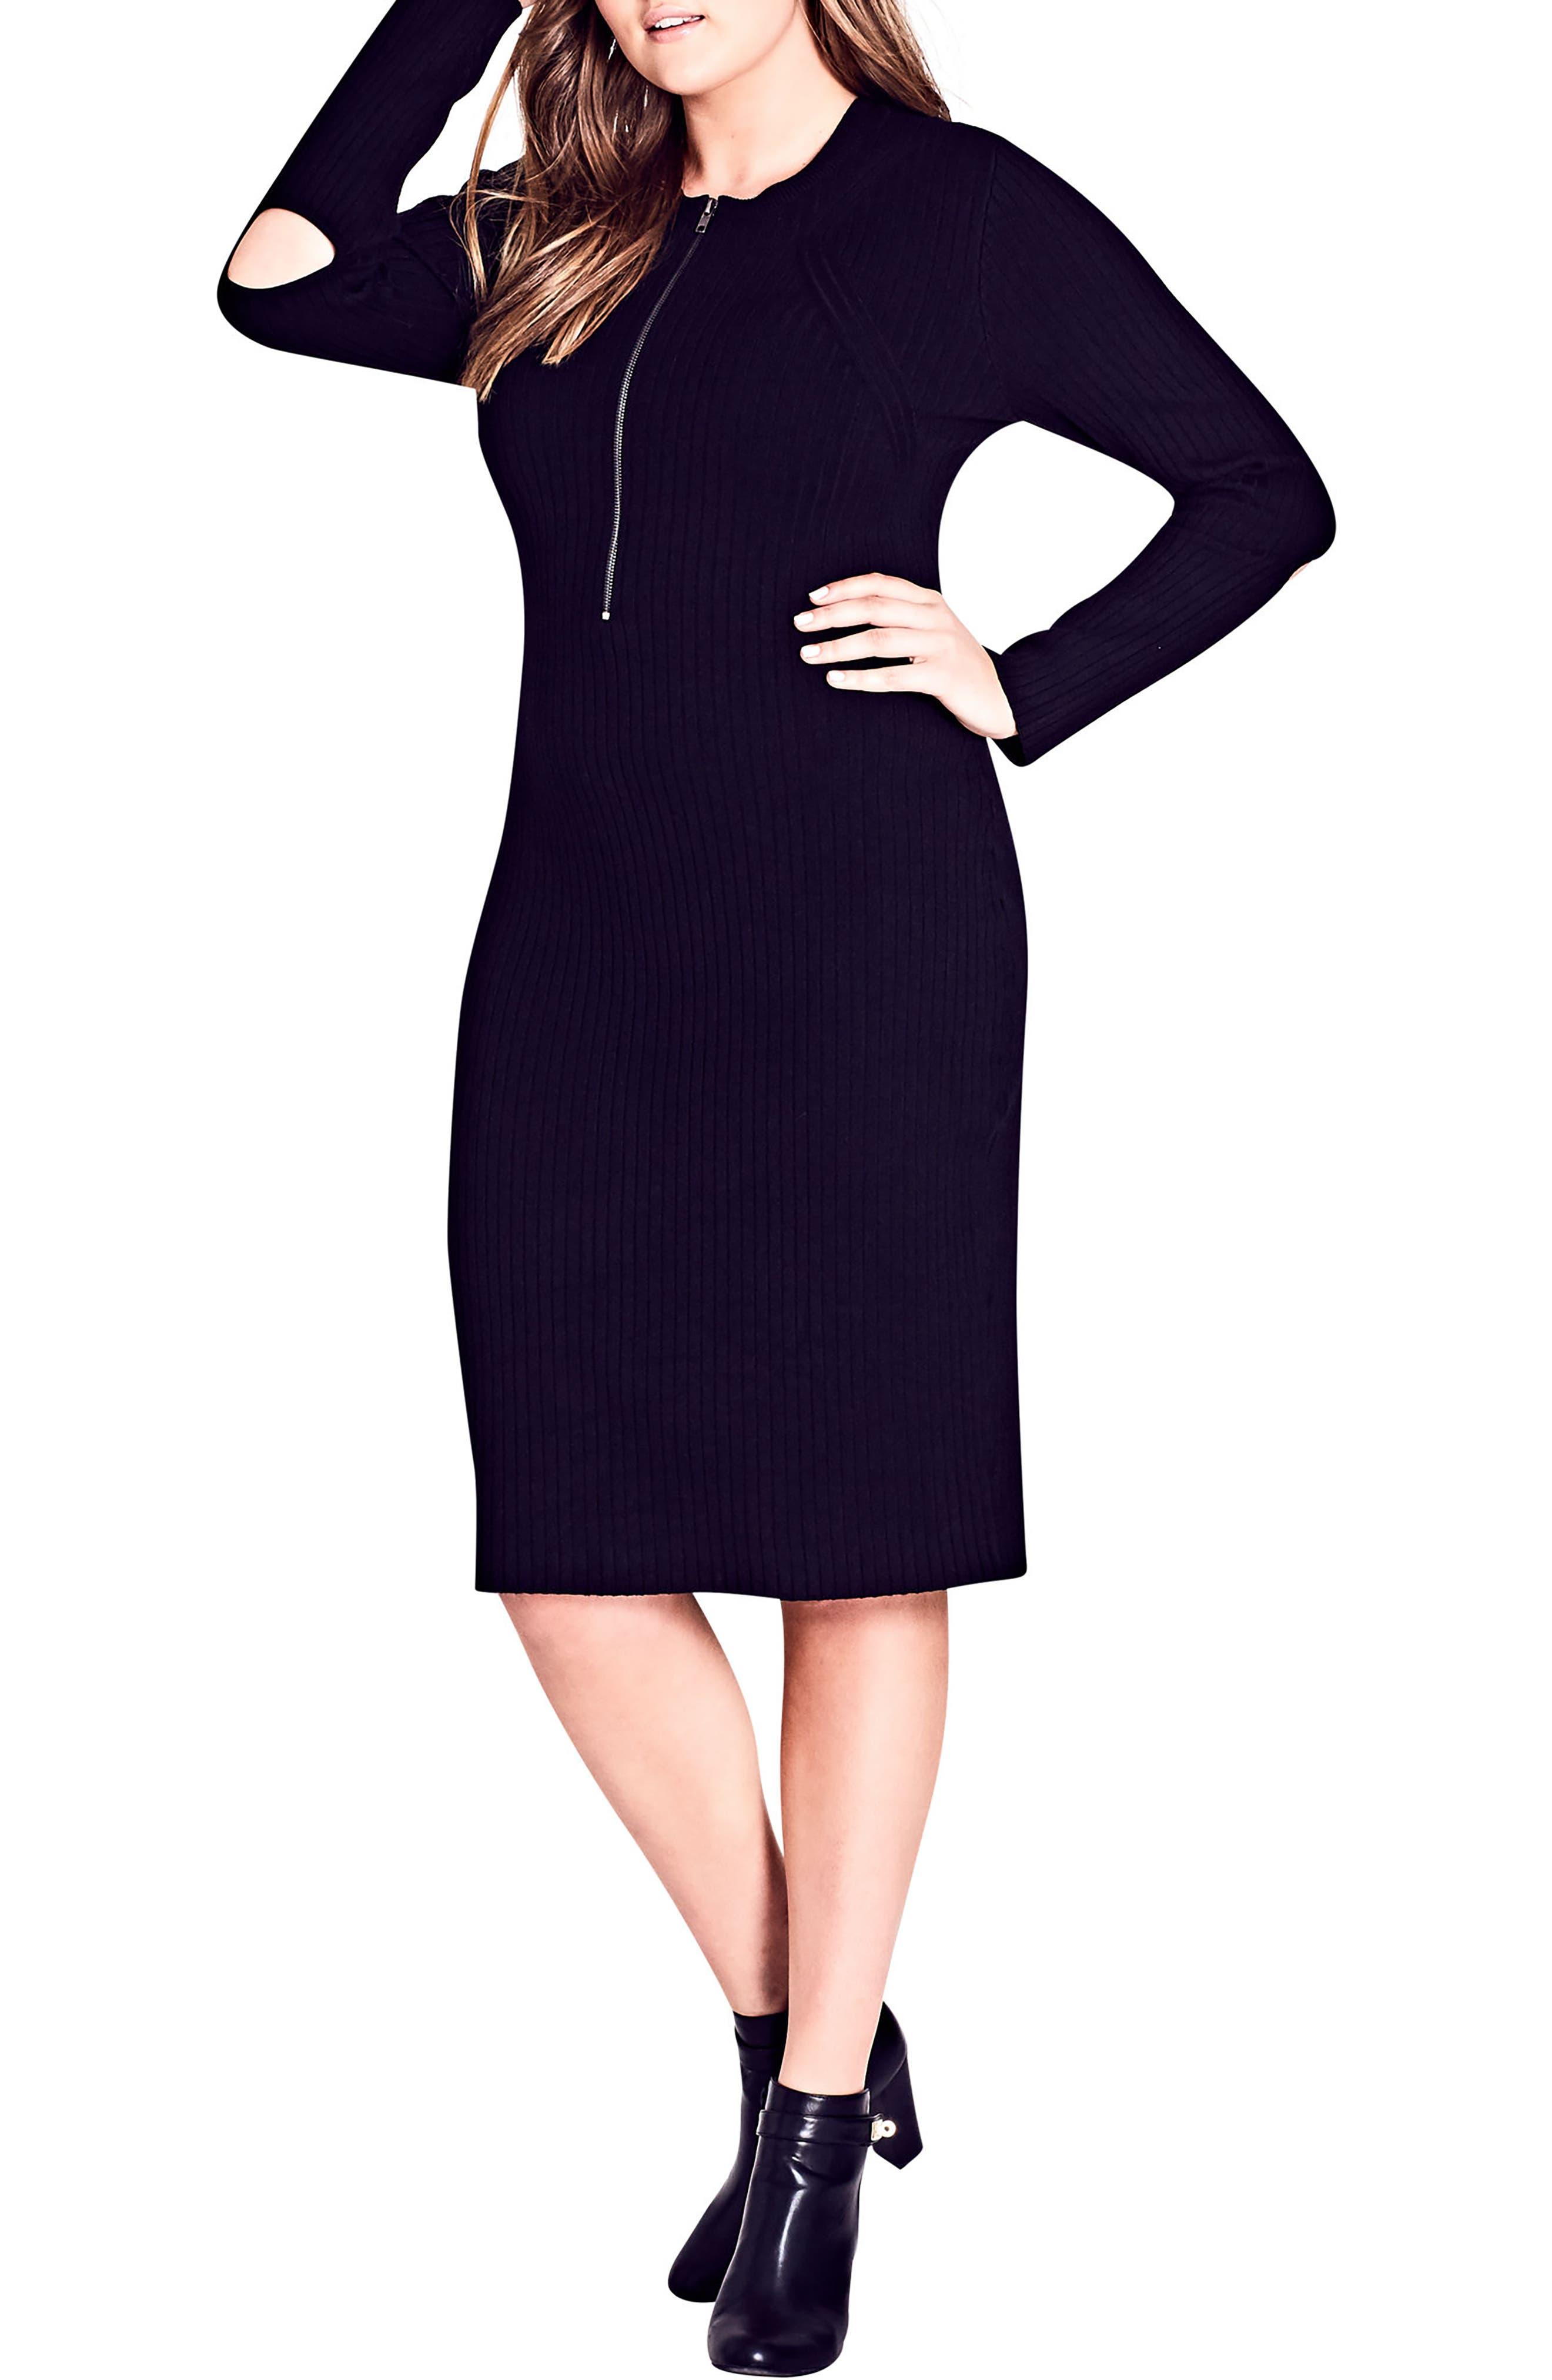 Zipped Up Sweater Dress,                         Main,                         color, Black